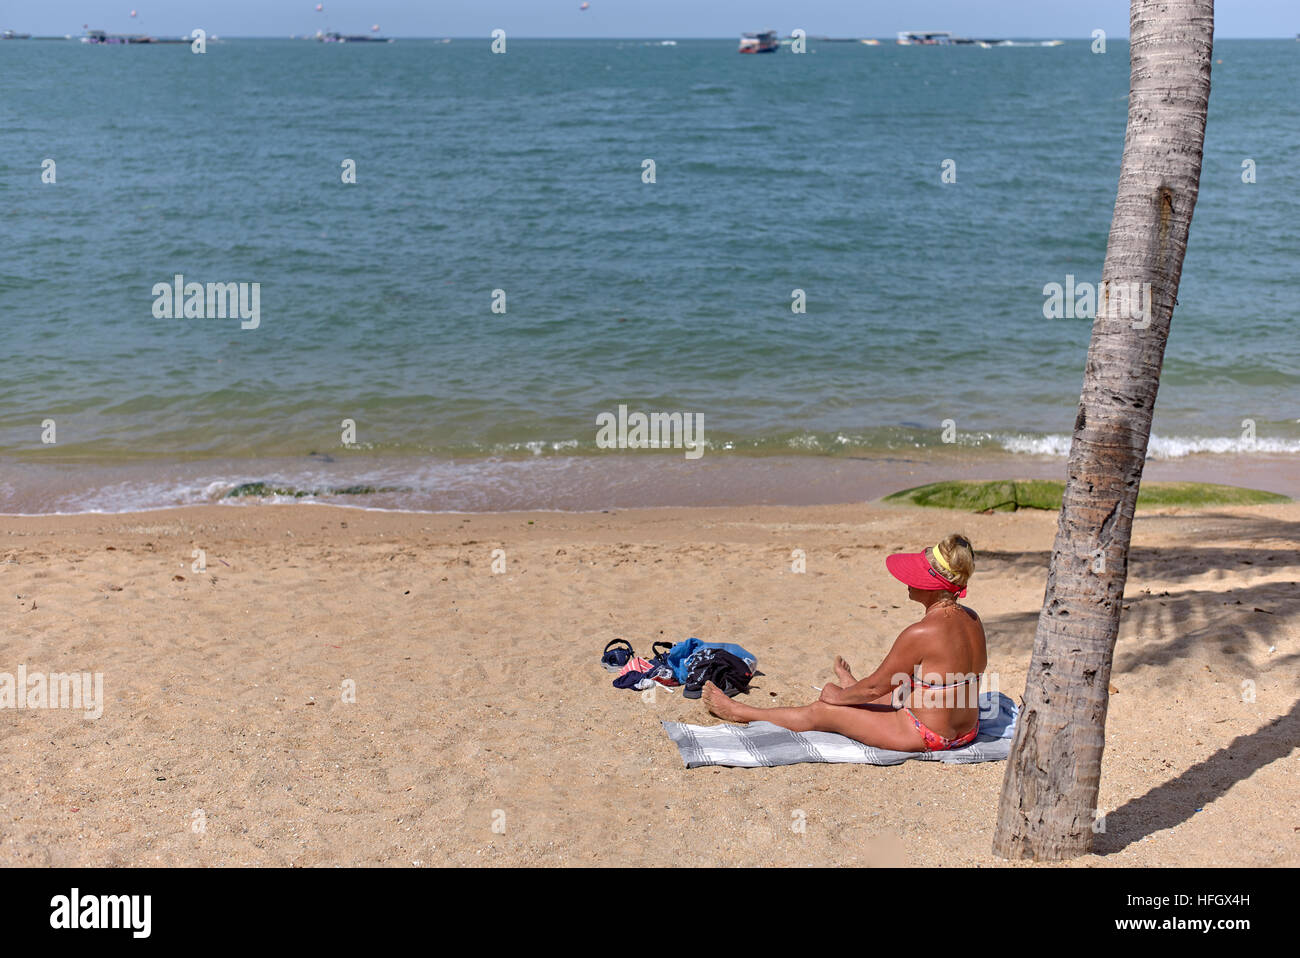 Bikini clad female sunbathing on a tropical beach. Pattaya Thailand S. E. Asia - Stock Image